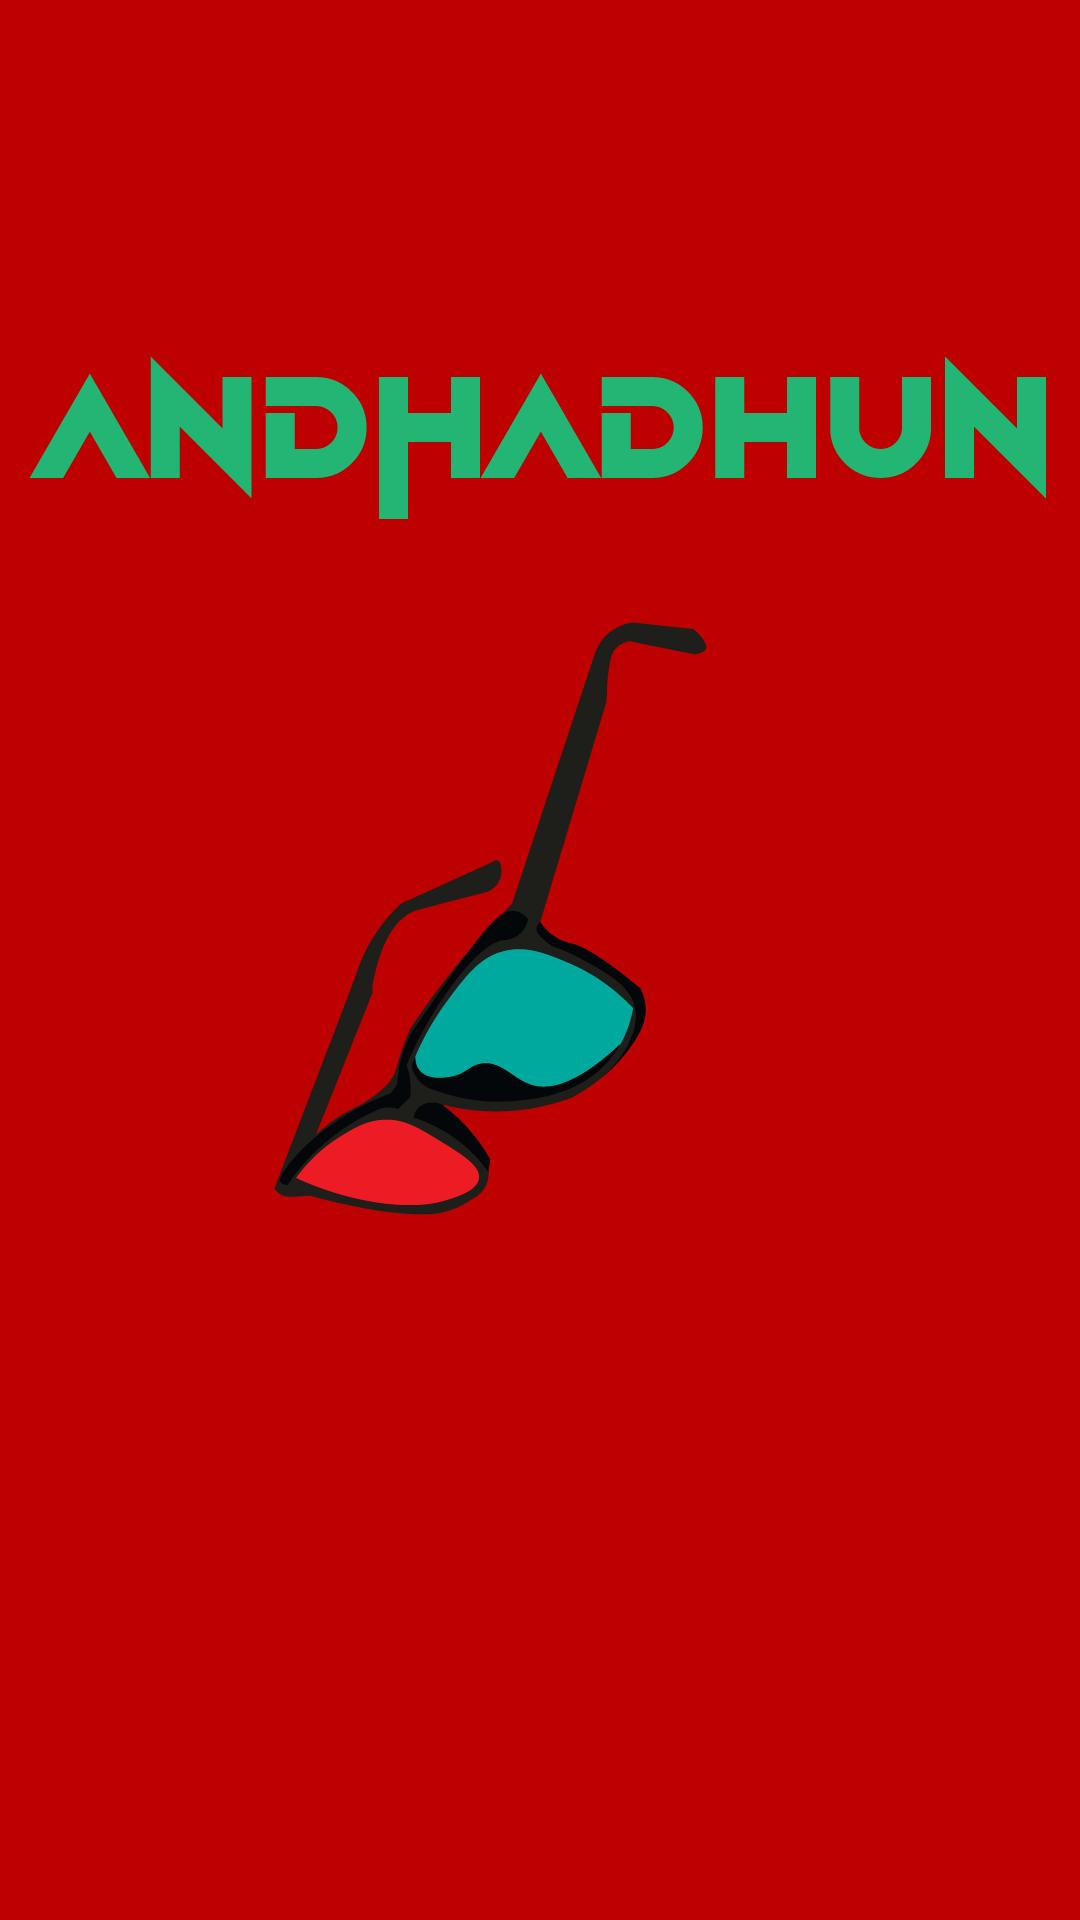 Andhadhun Minimal Poster Vector Illustration In 2020 Bollywood Posters Minimalist Poster Minimal Poster